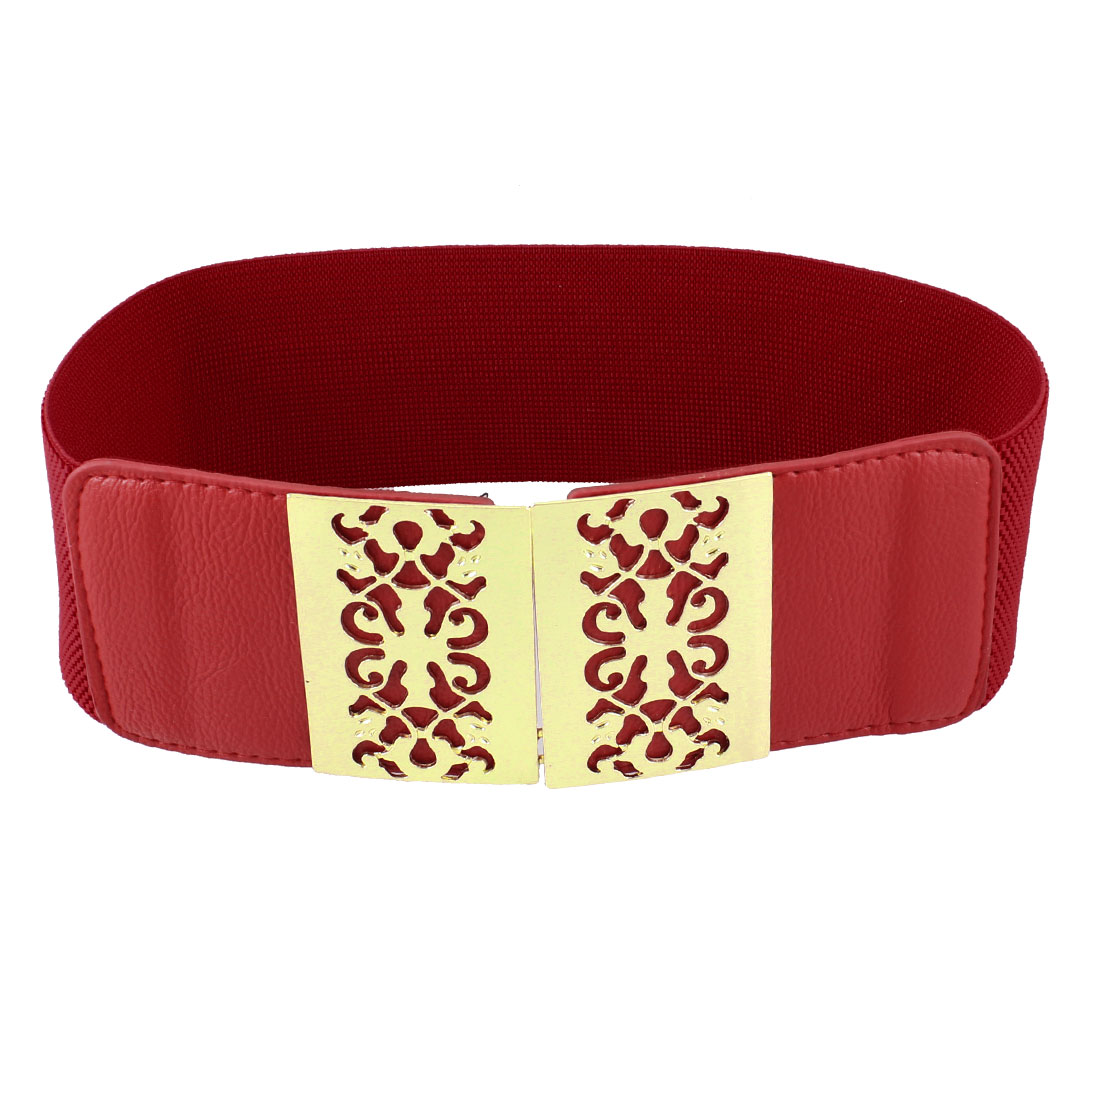 Woman Faux Leather Metal Interlocking Buckle Closure Elastic Waist Belt Red